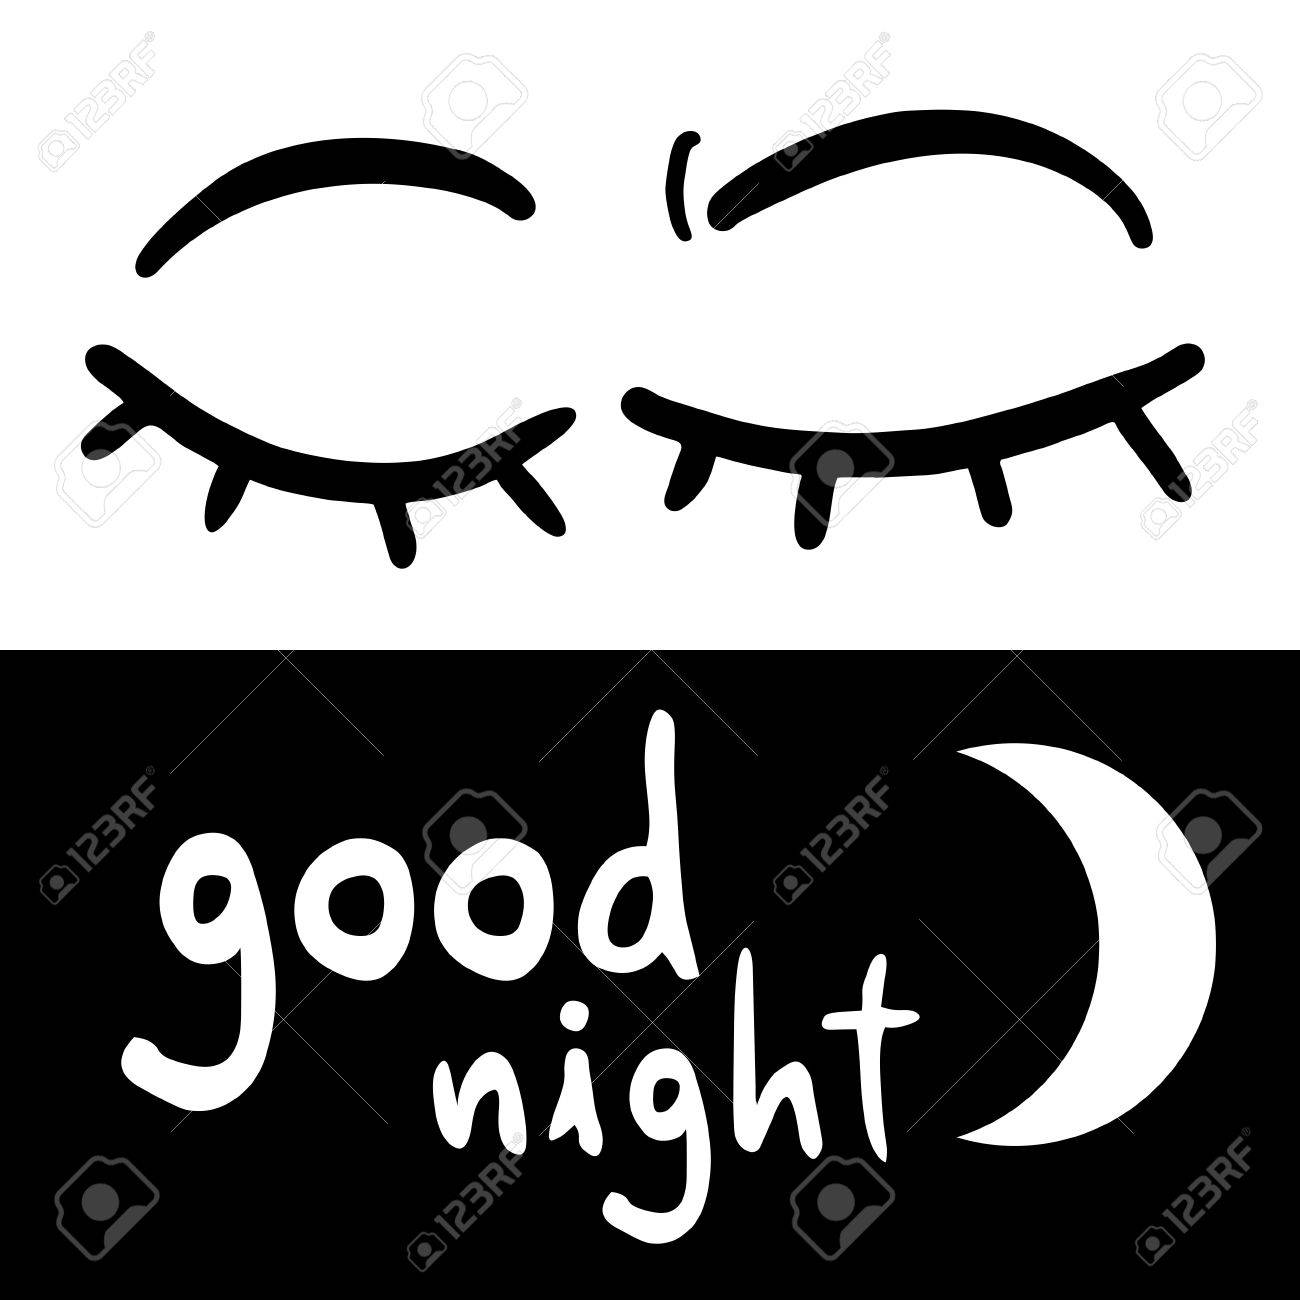 Good Night Symbol Royalty Free Cliparts Vectors And Stock